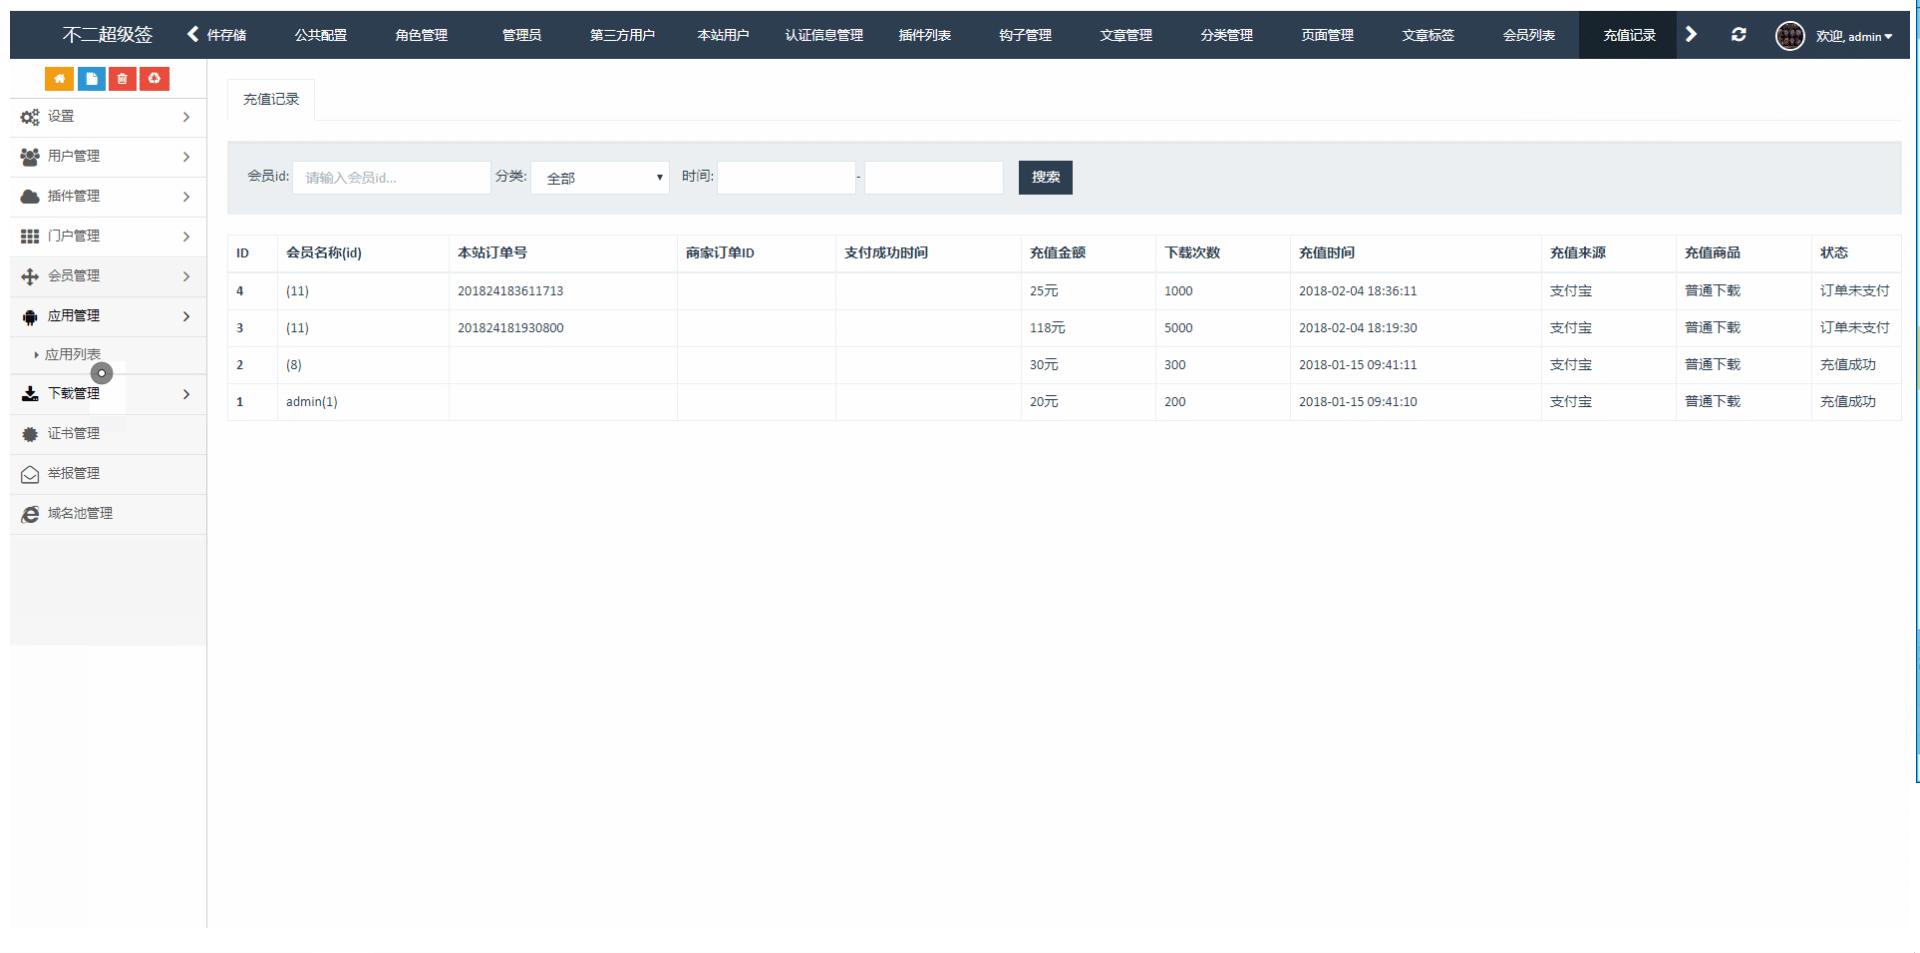 【IOS分发超级签】新版IOS应用分发+ios签名超级签名+防封系统源码支持安卓ios合并下载